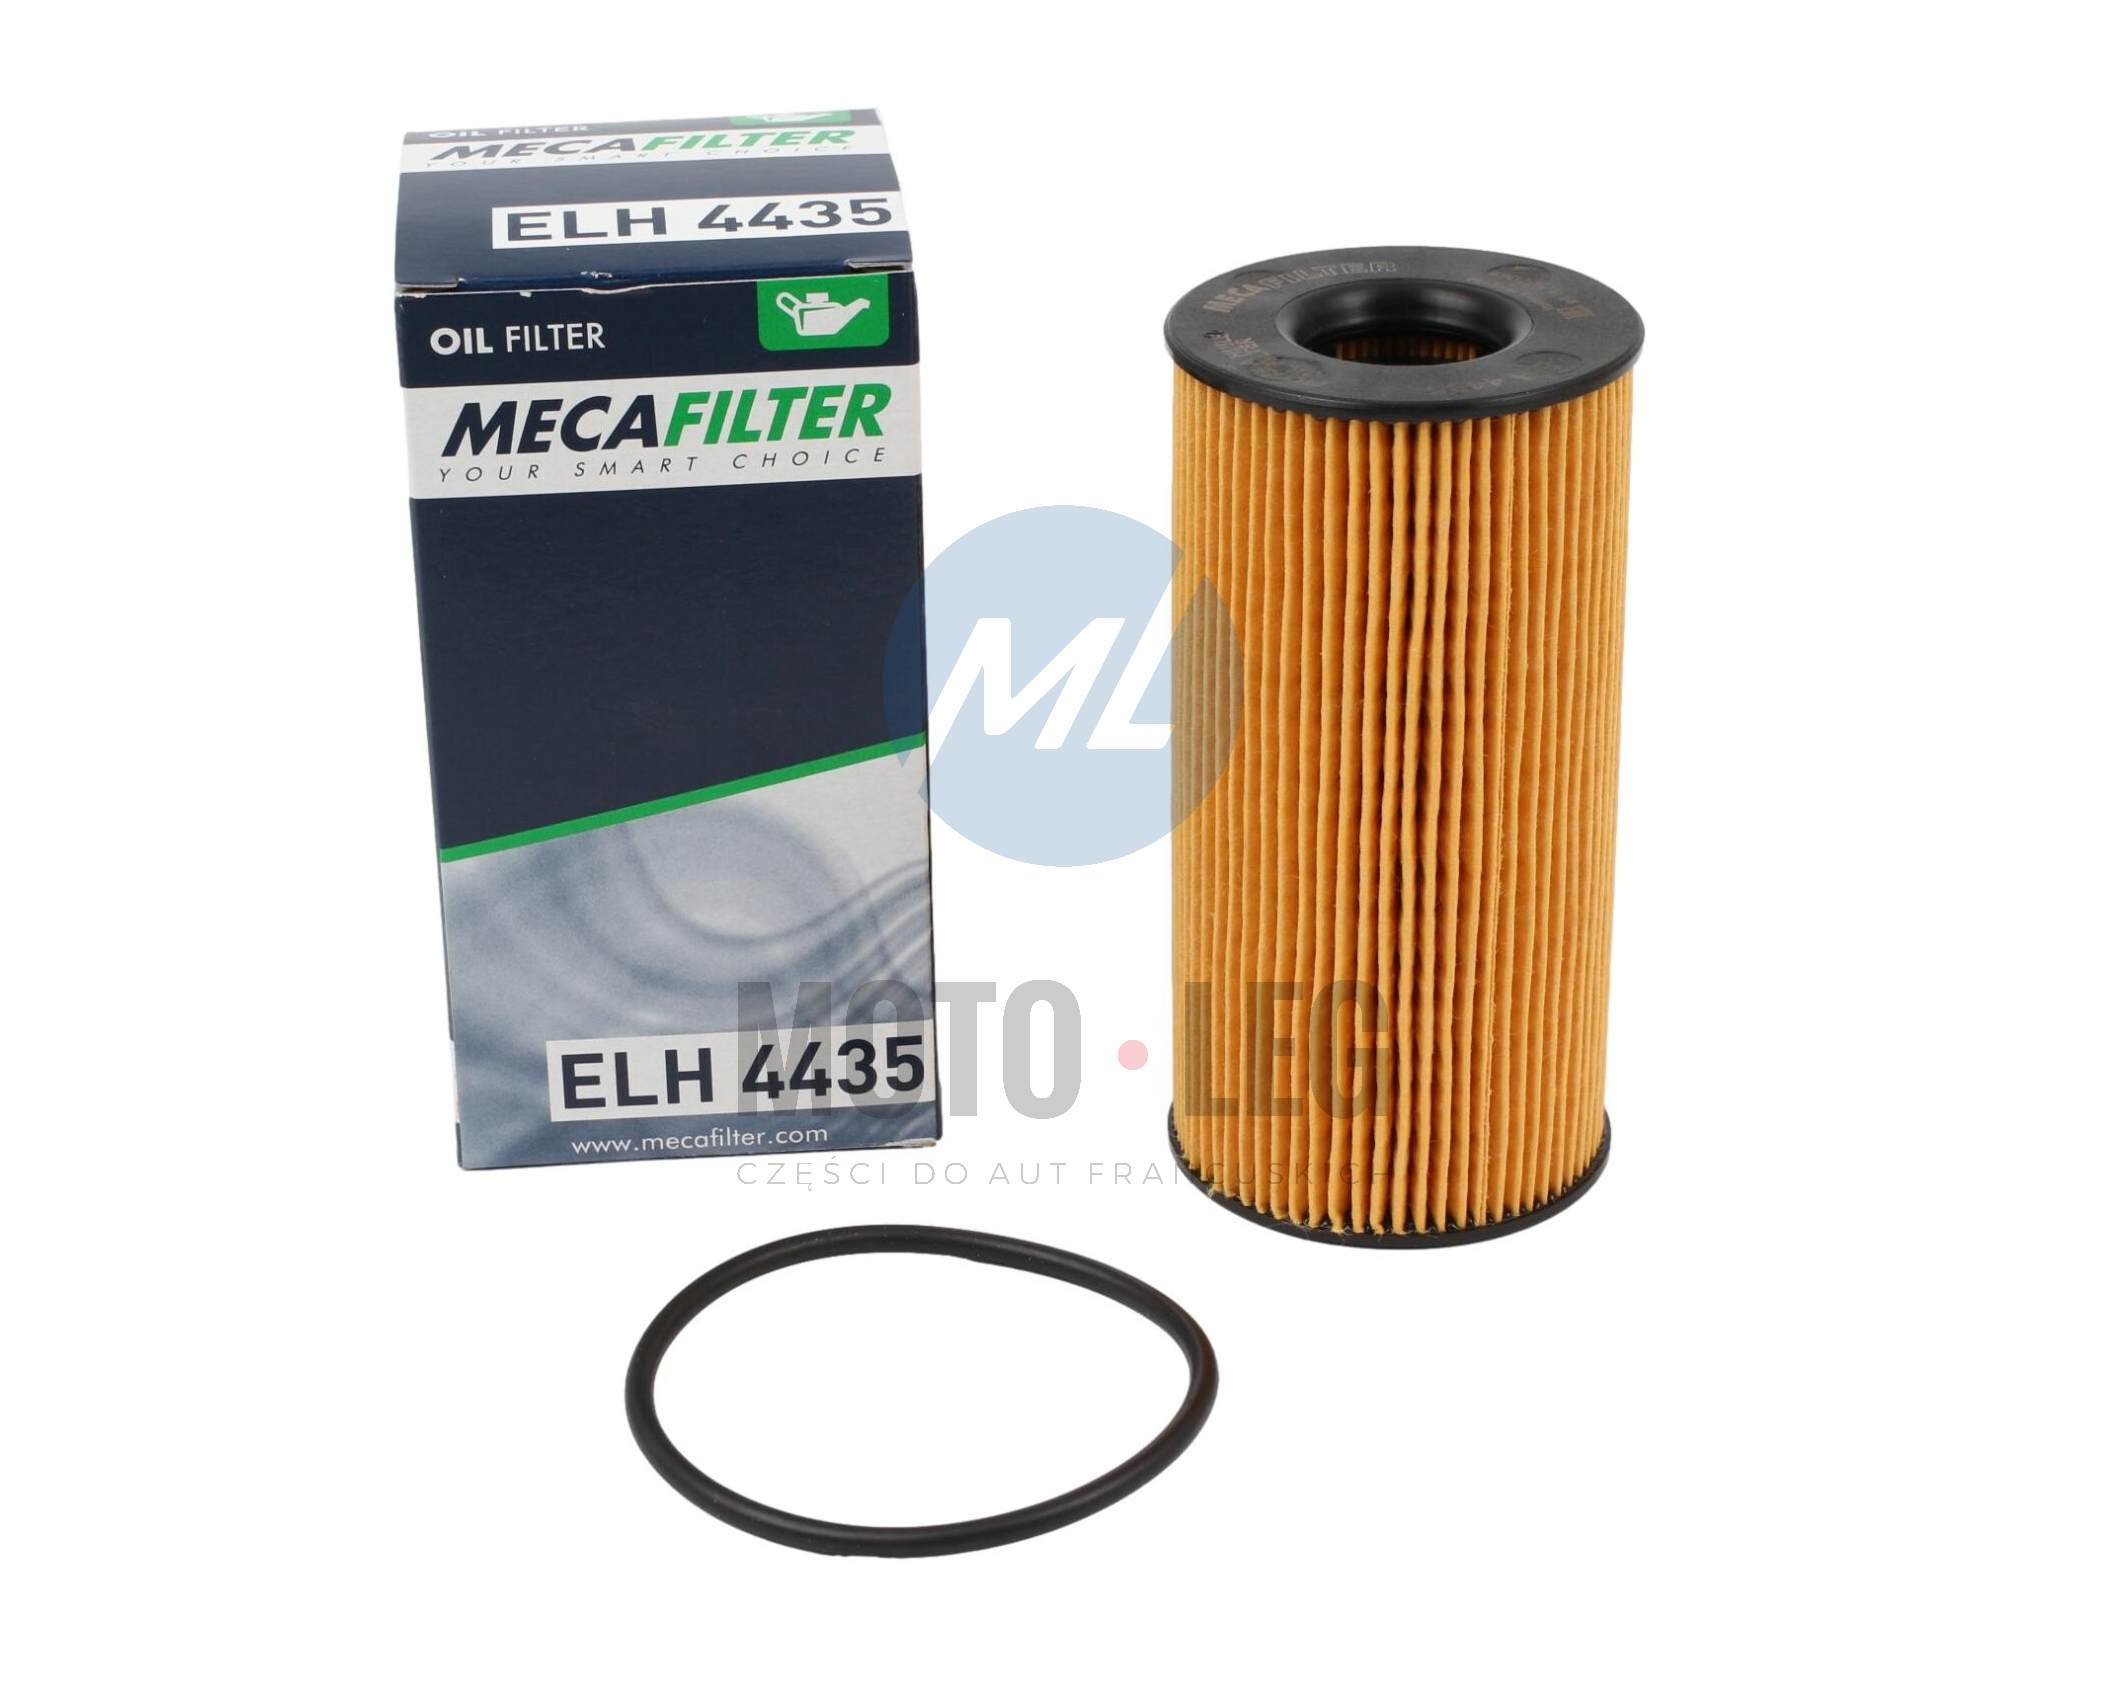 MECAFILTER ELH 4435